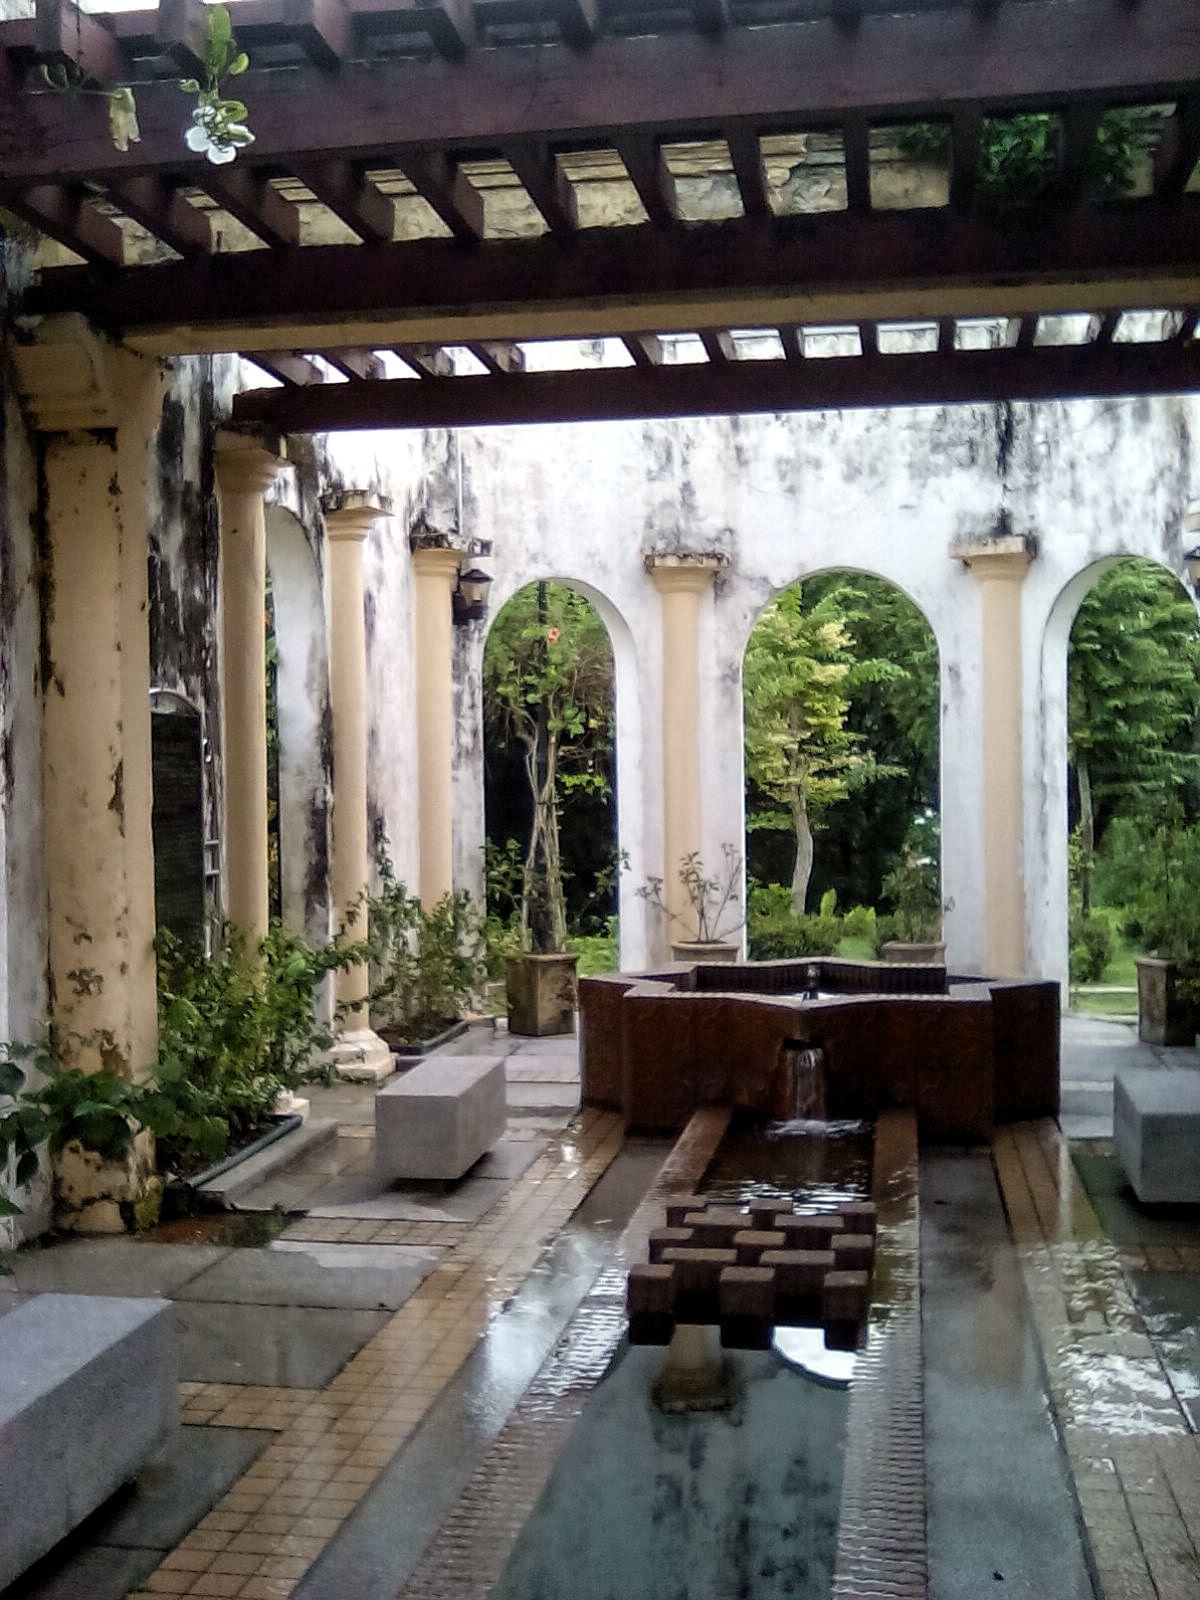 kuala lumpur hibiscus garden visite gratuite malaisie voyage